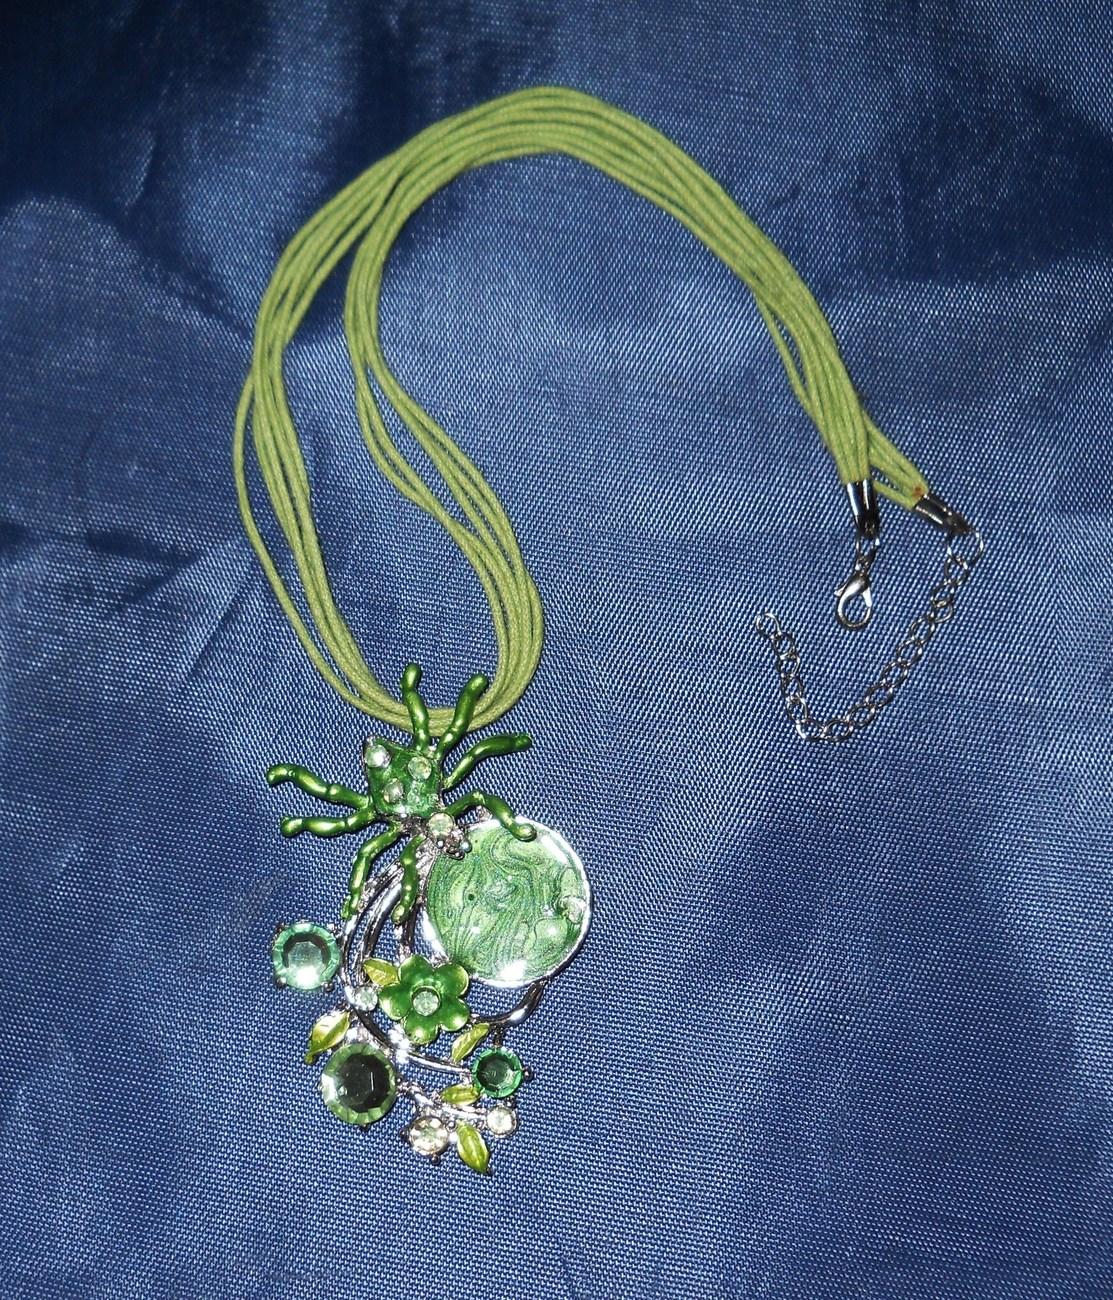 GREEN SPIDER NECKLACE